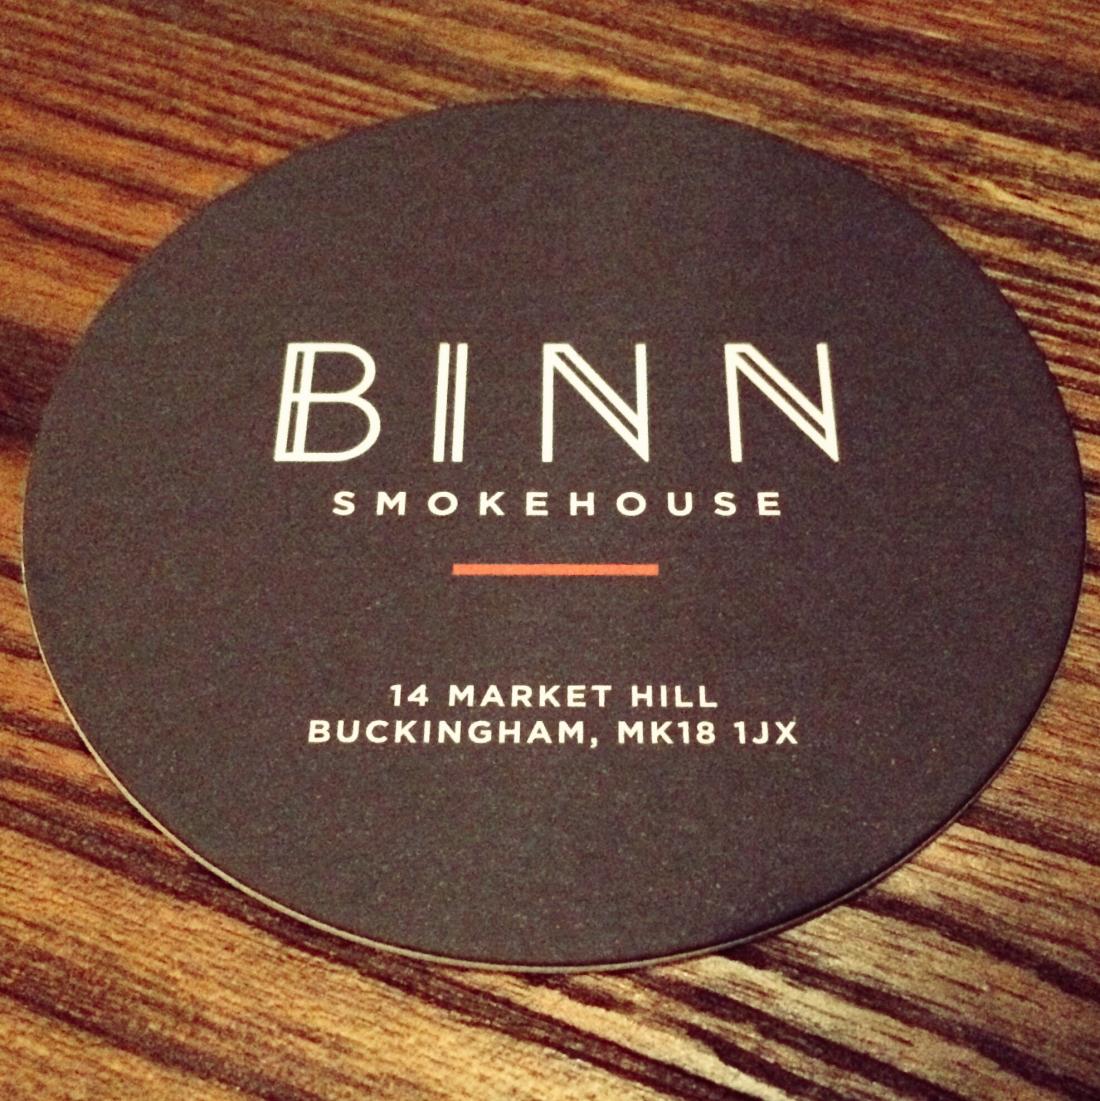 Binn Smokehouse Logo